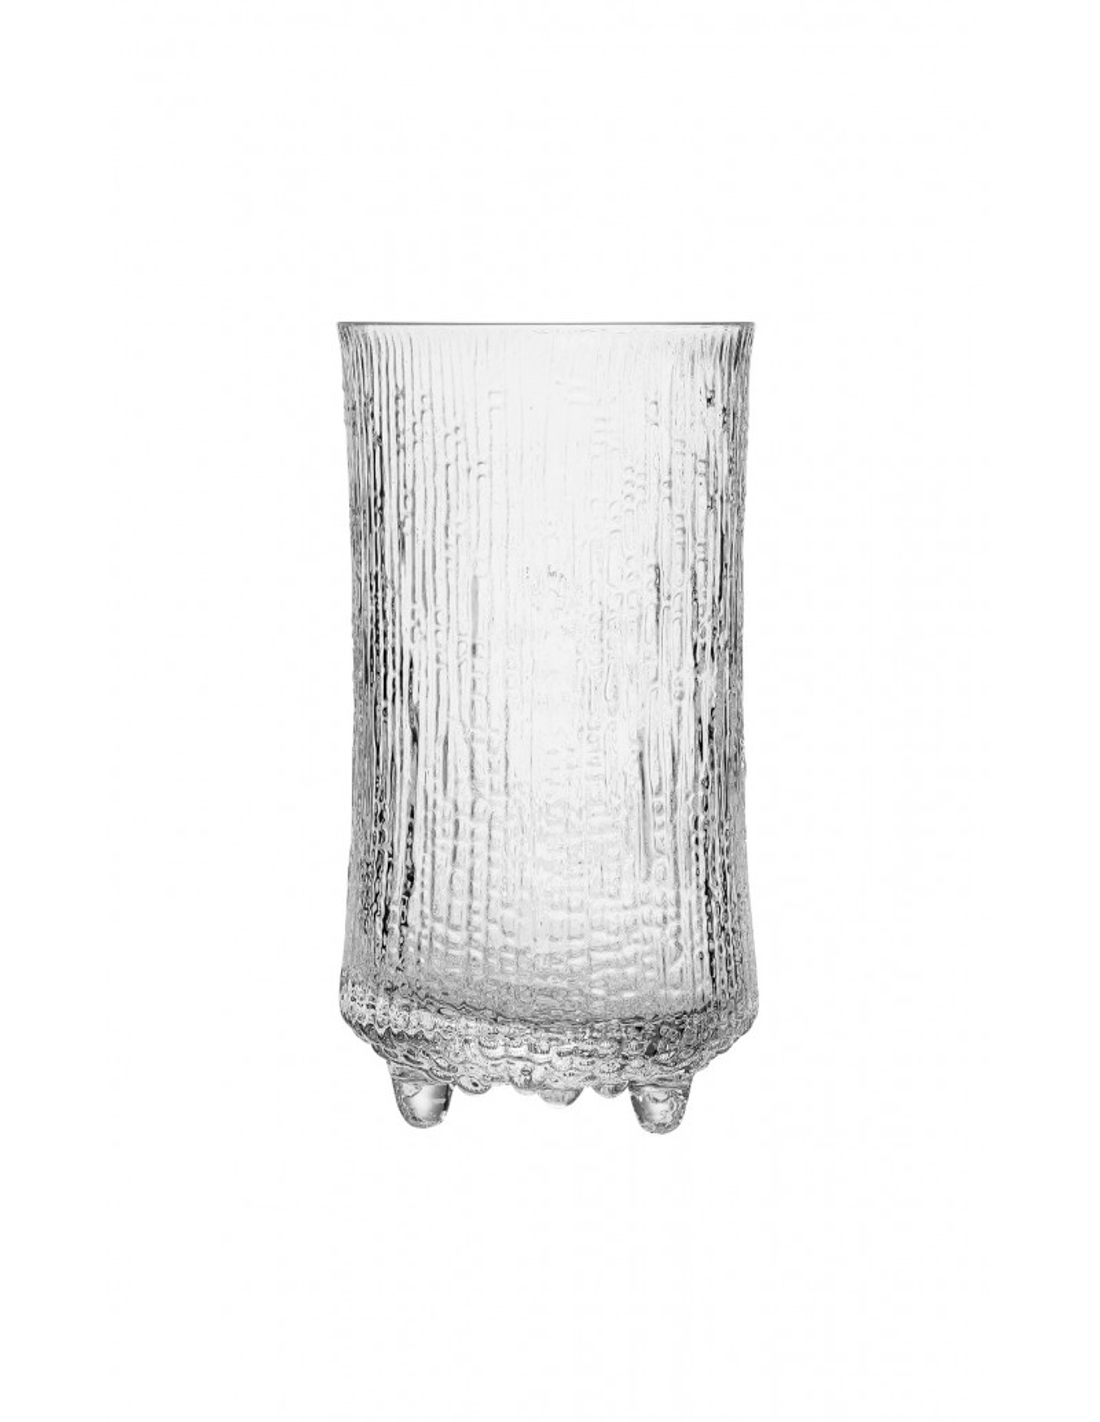 ultima thule glasses by tapio wirkkala iittala. Black Bedroom Furniture Sets. Home Design Ideas